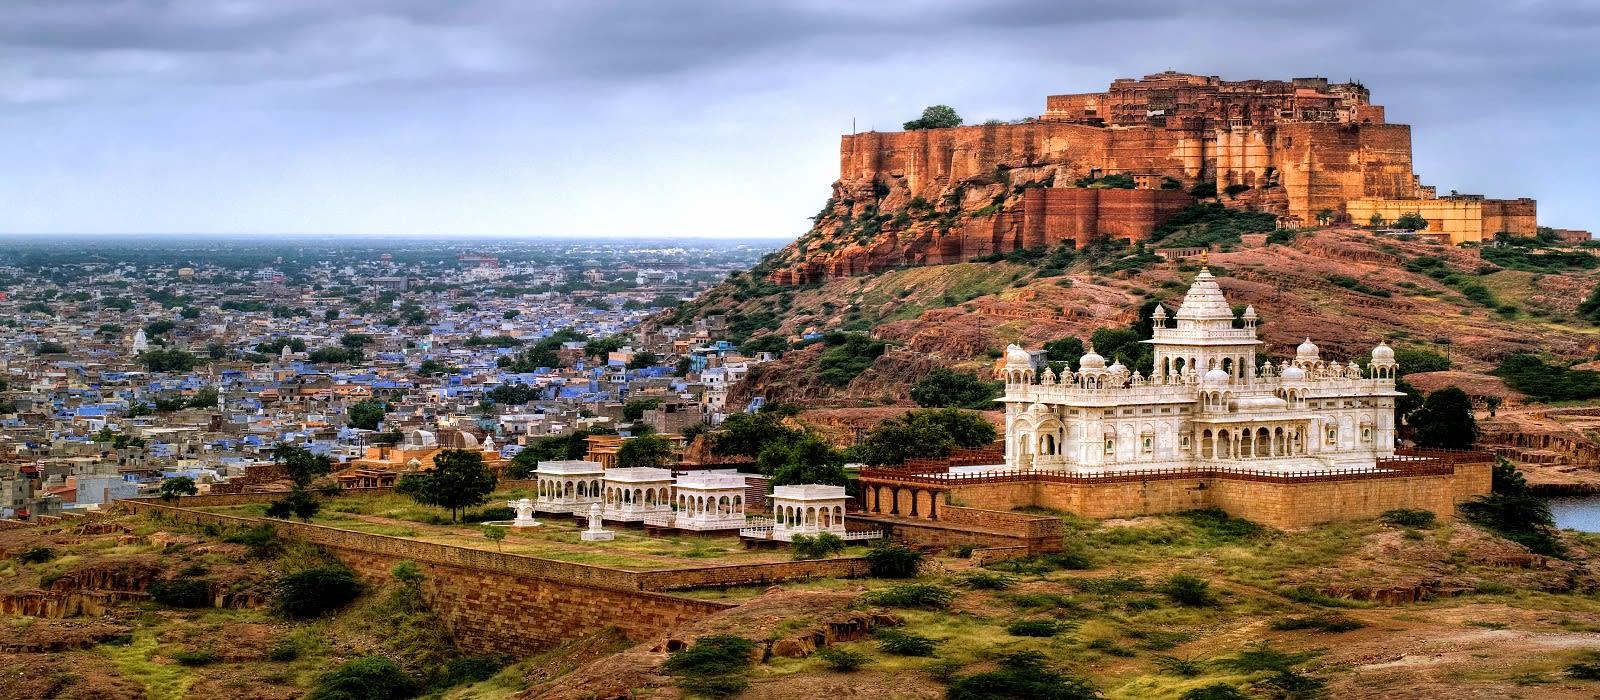 Oberoi Exclusive: Rajasthan's Heritage Cities and Safari Tour Trip 2